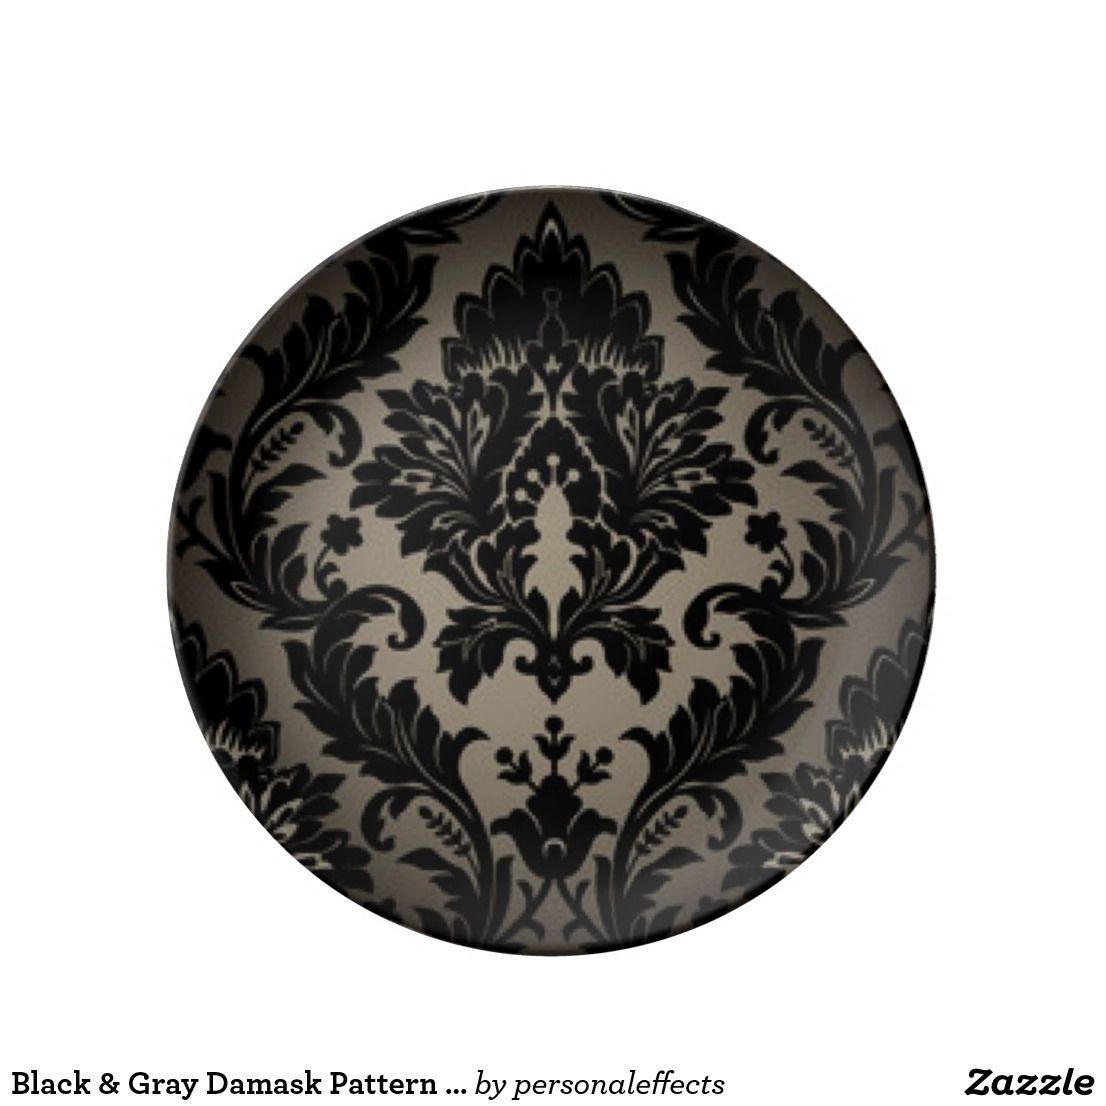 Black & Gray Damask Pattern Print Dinner Plate - damask, floral, flower, flowers, vintage, pattern, print, black, gray, black gray damask